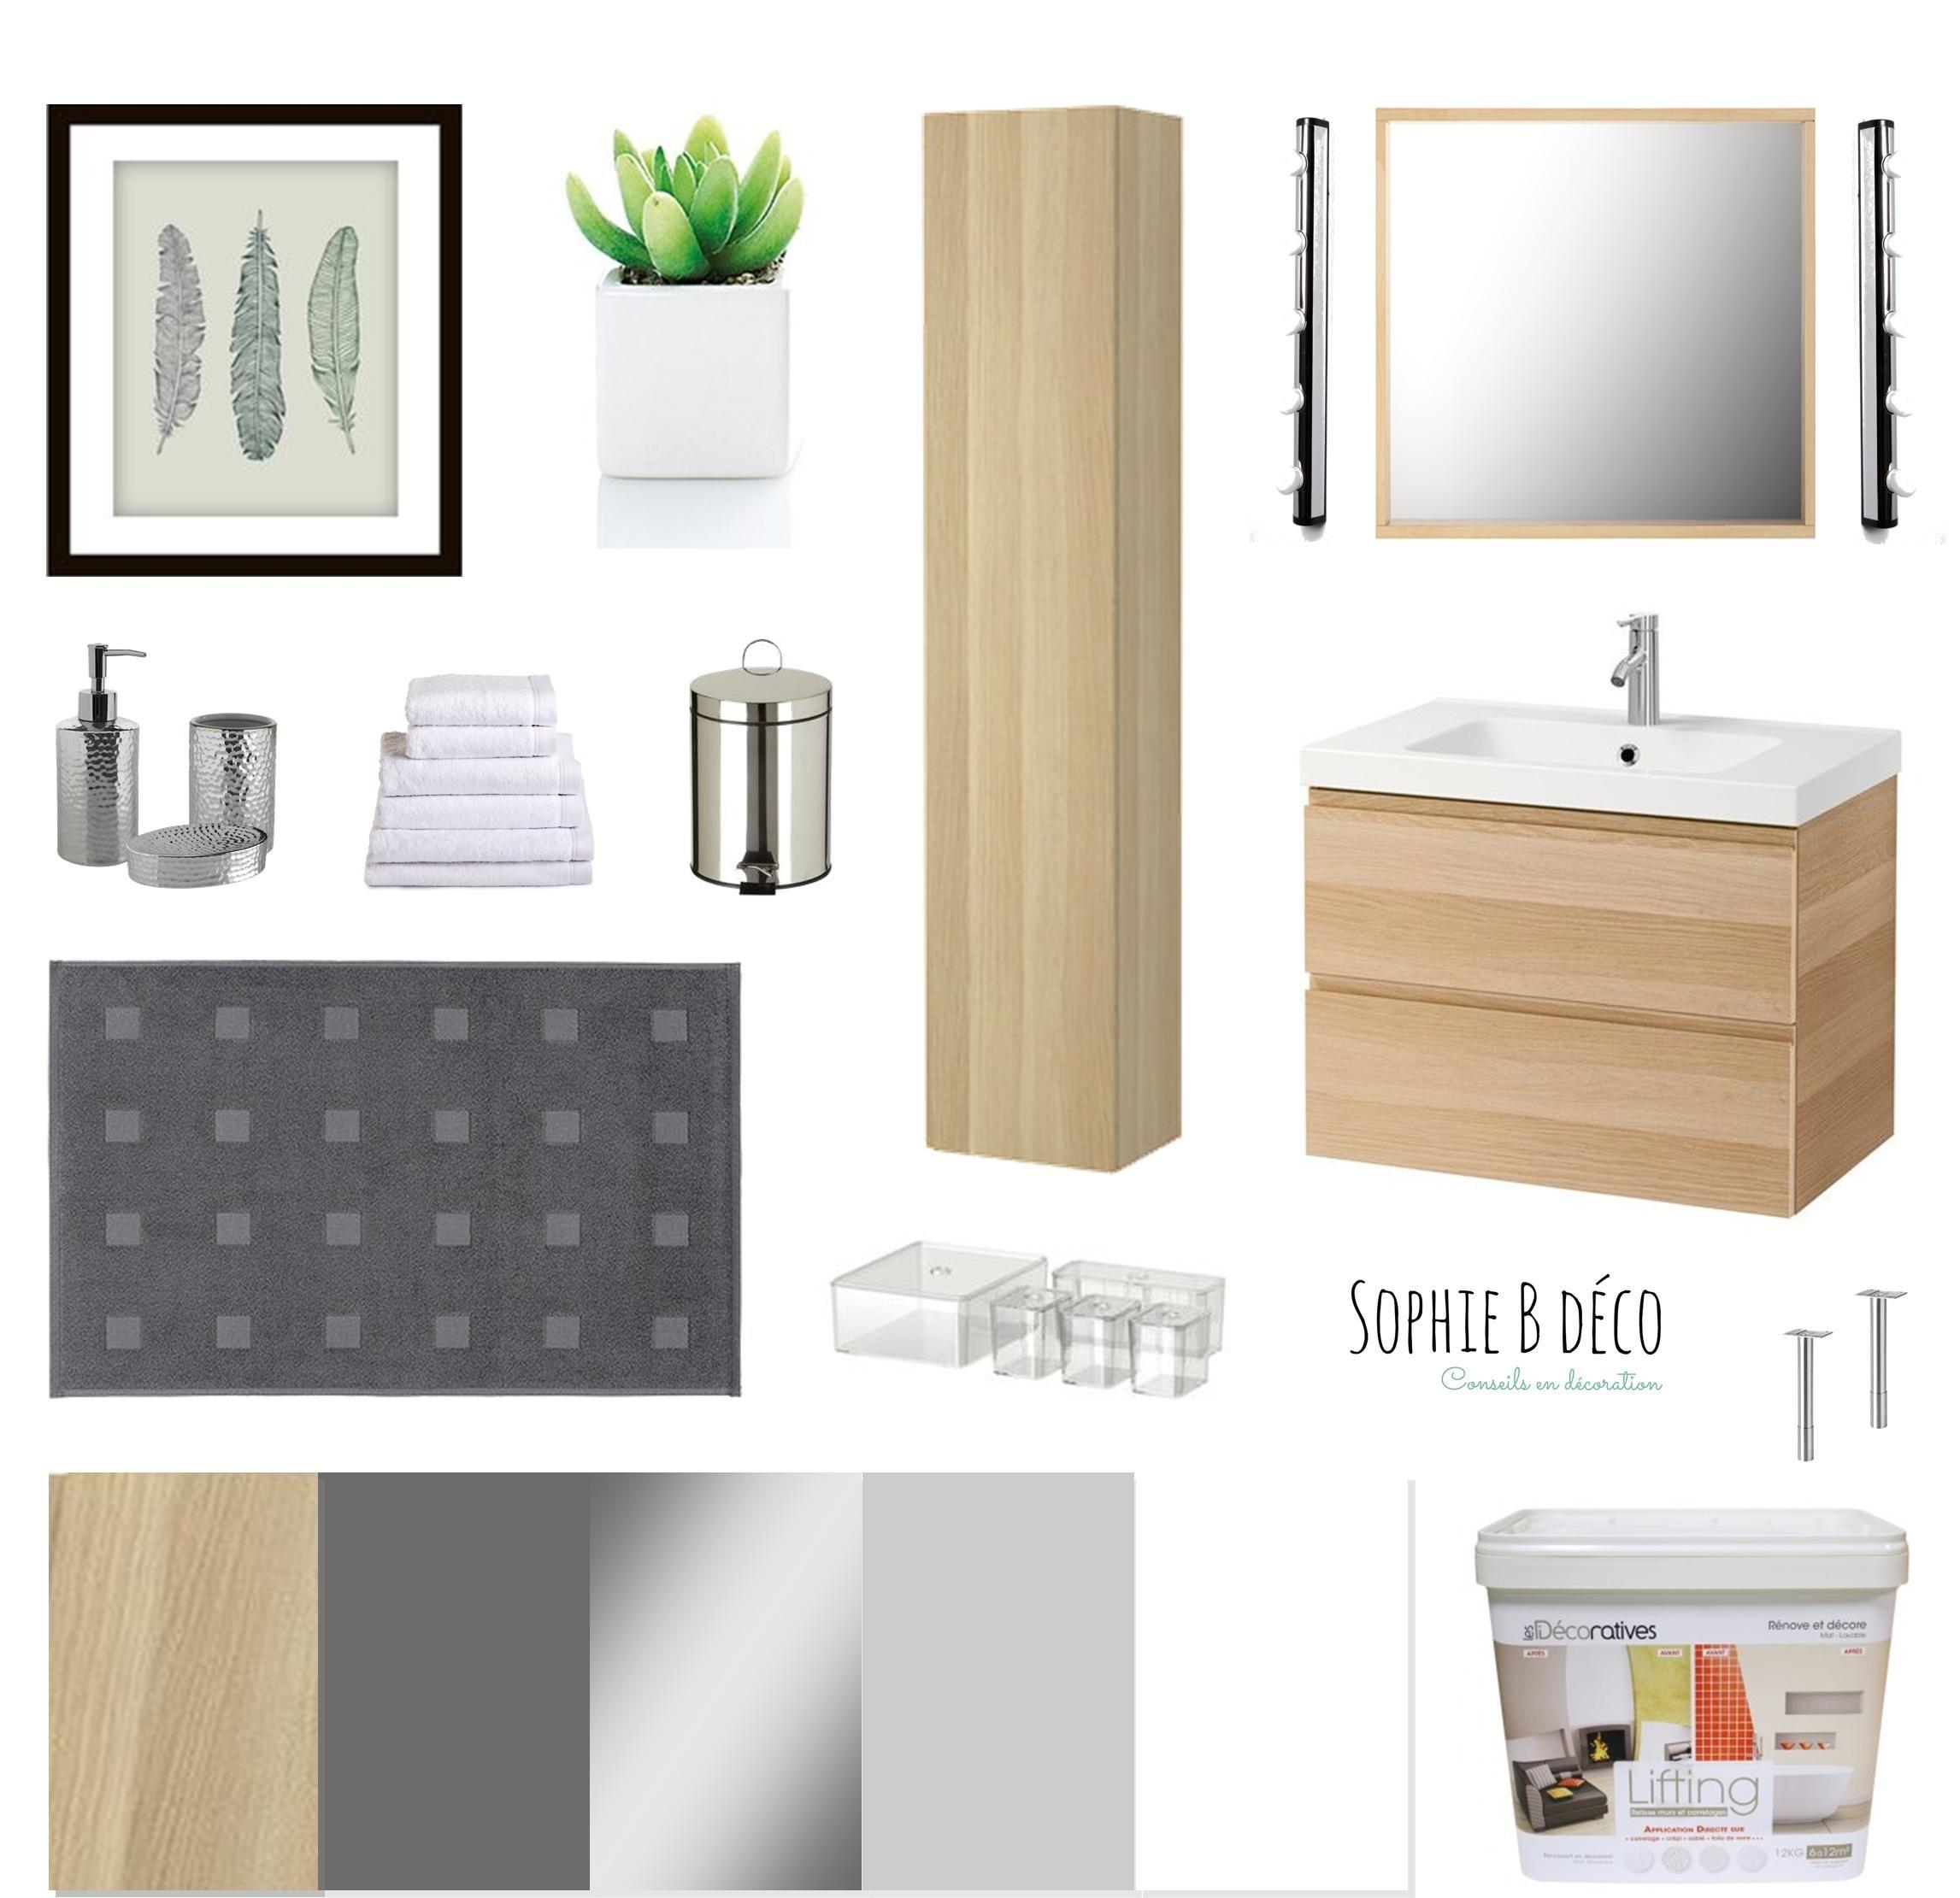 Armoire Salle De Bain Kijiji Sherbrooke ~ Planche Shopping R Novation Salle De Bain Bois Gris Blanc Godmorgon